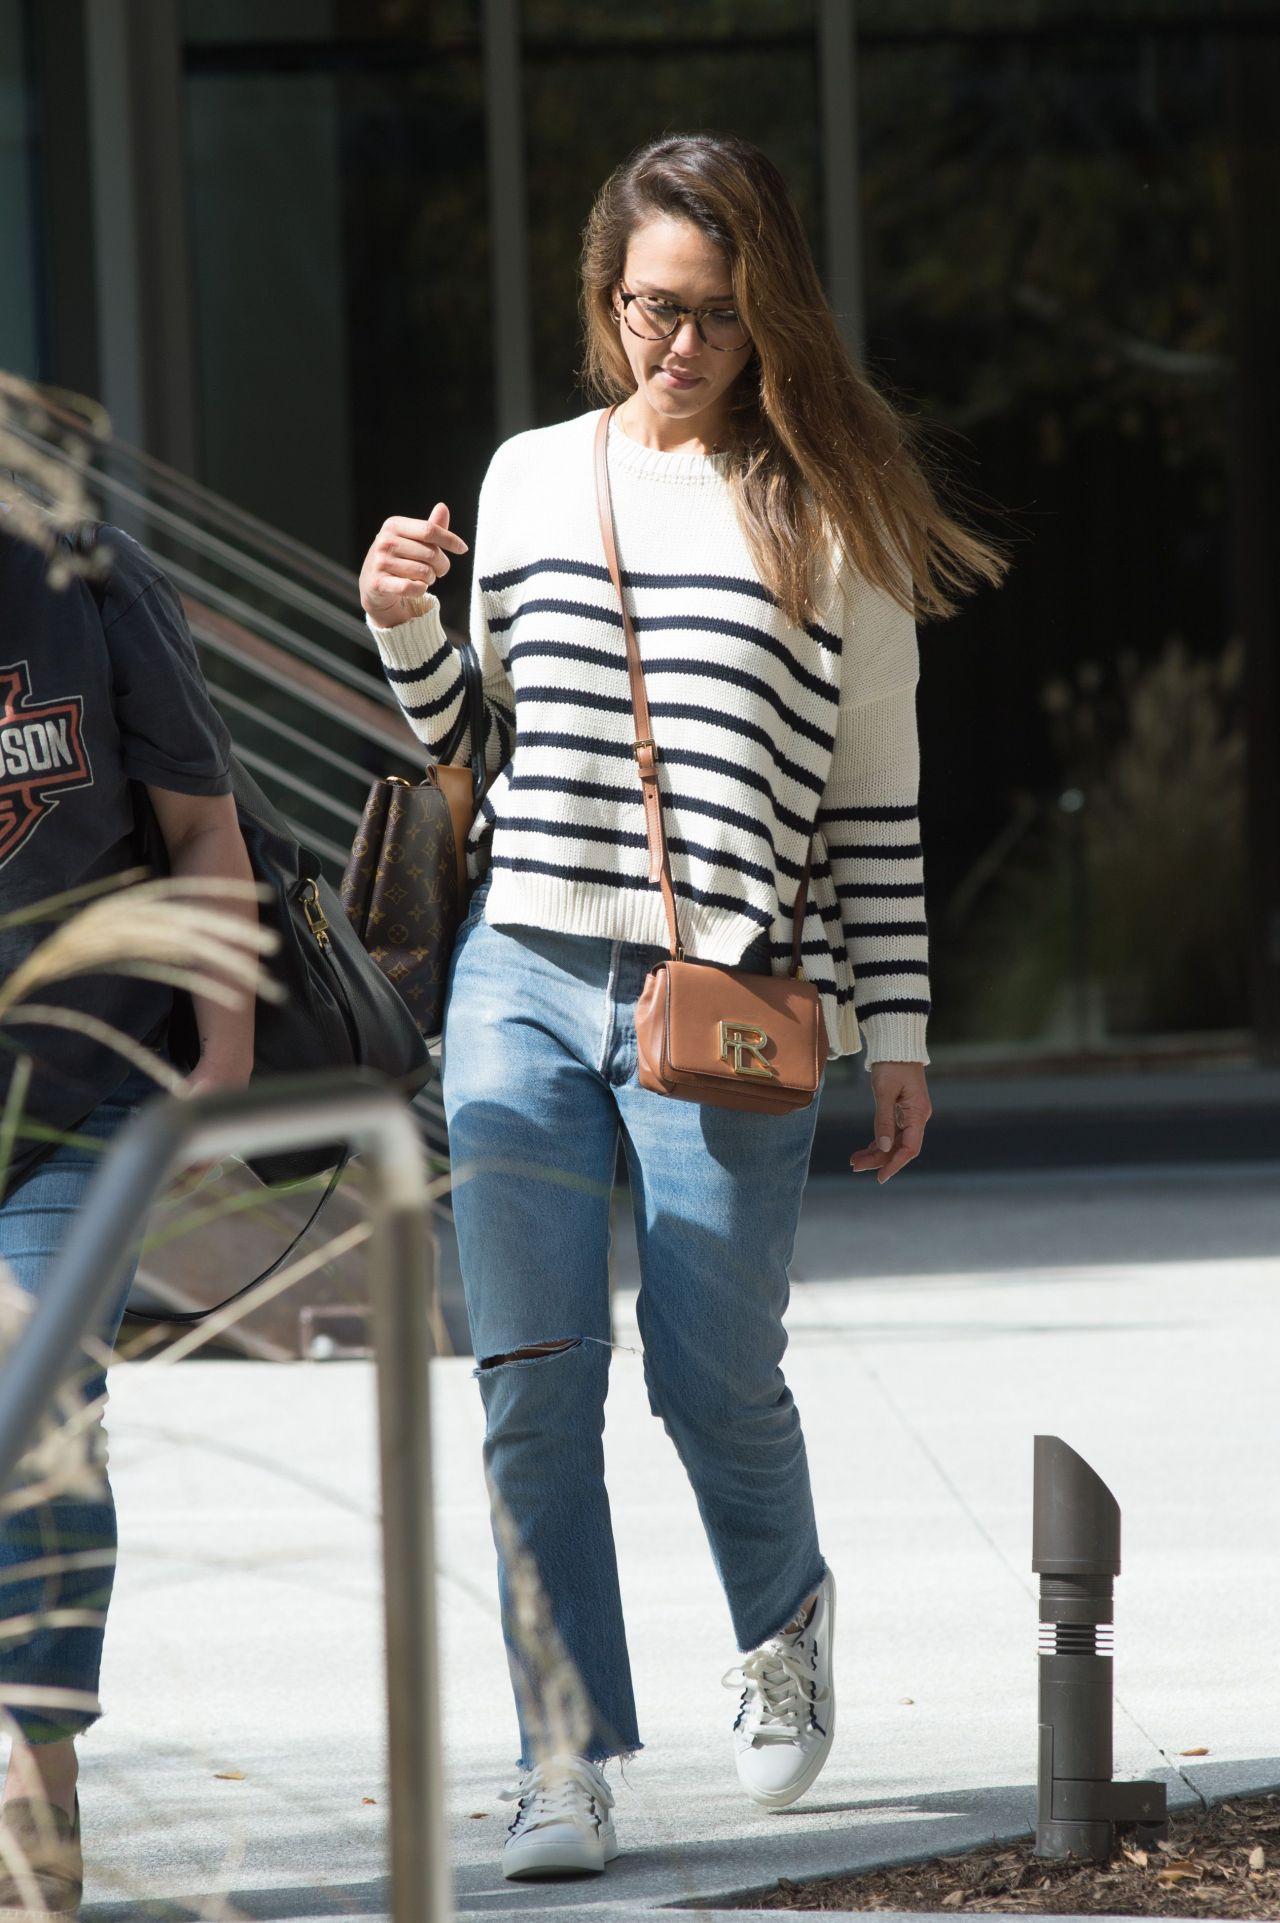 http://celebmafia.com/wp-content/uploads/2017/03/jessica-alba-wearing-a-ralph-lauren-handbag-los-angeles-3-14-2017-4.jpg